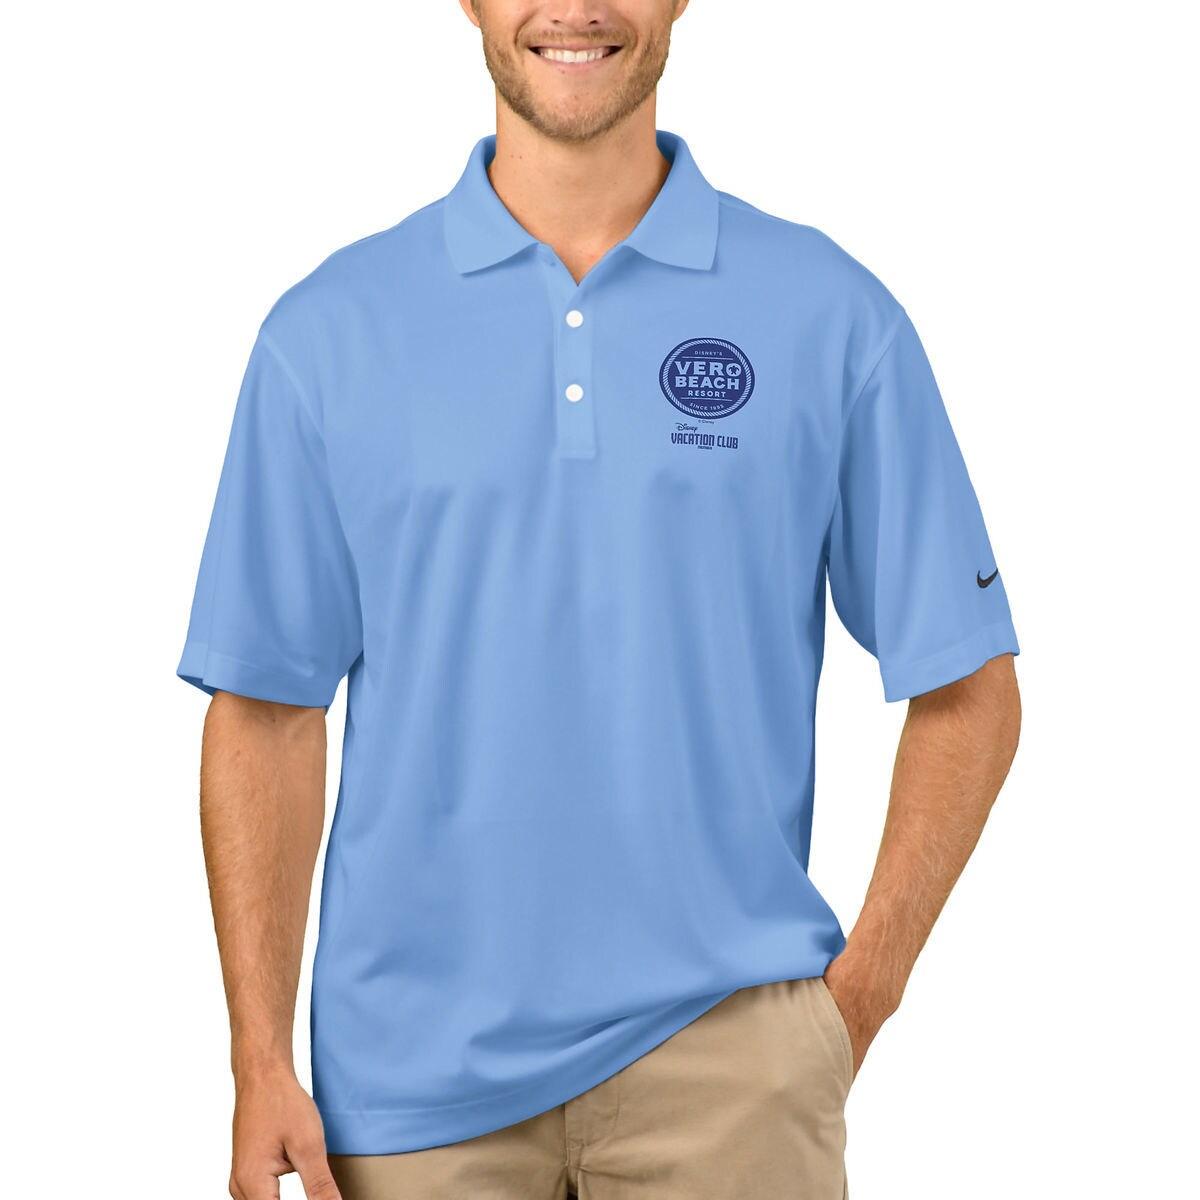 Product Image Of Disney Vacation Club Vero Beach Resort Nike Polo Shirt For Men Customizable